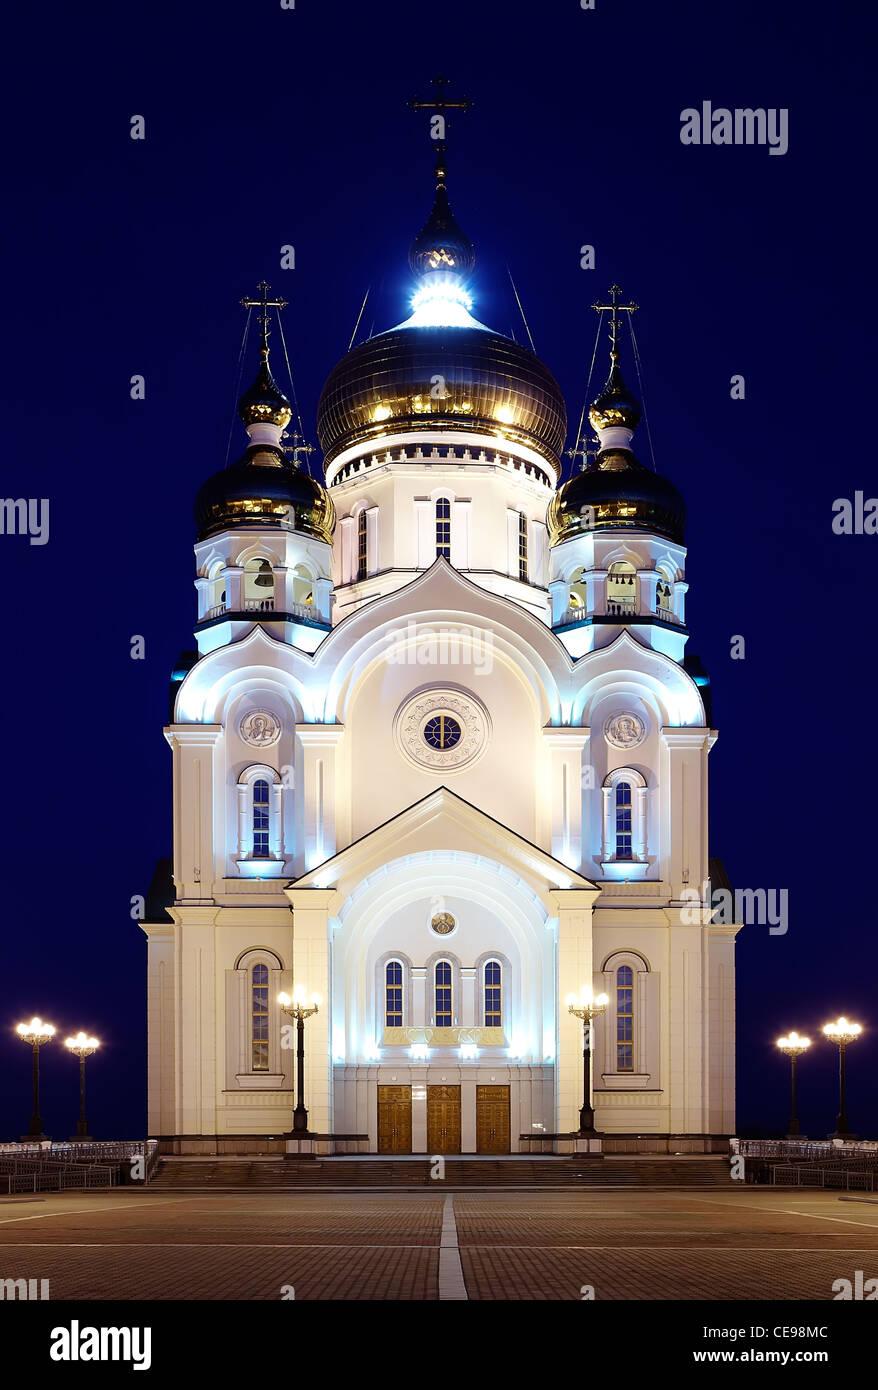 Orthodox Church in Khabarovsk, Russia - Stock Image